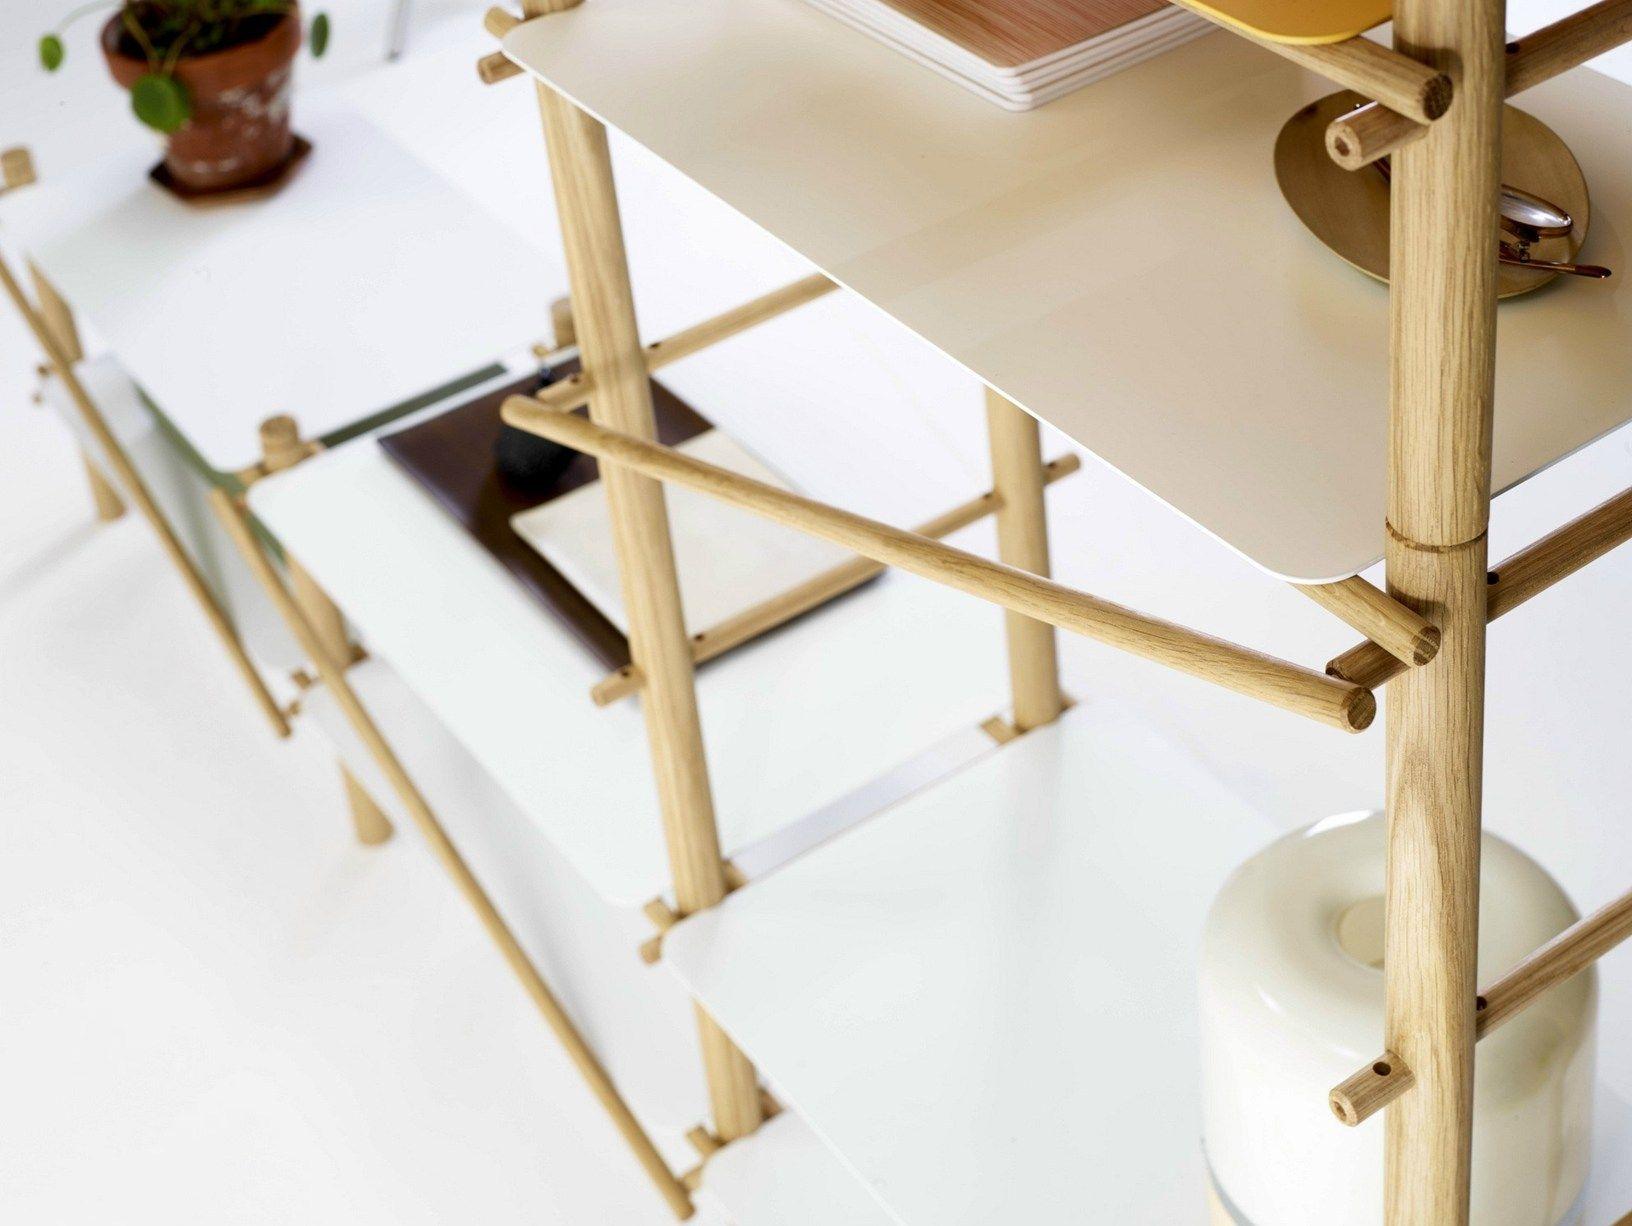 modular system furniture. Modular System Furniture T